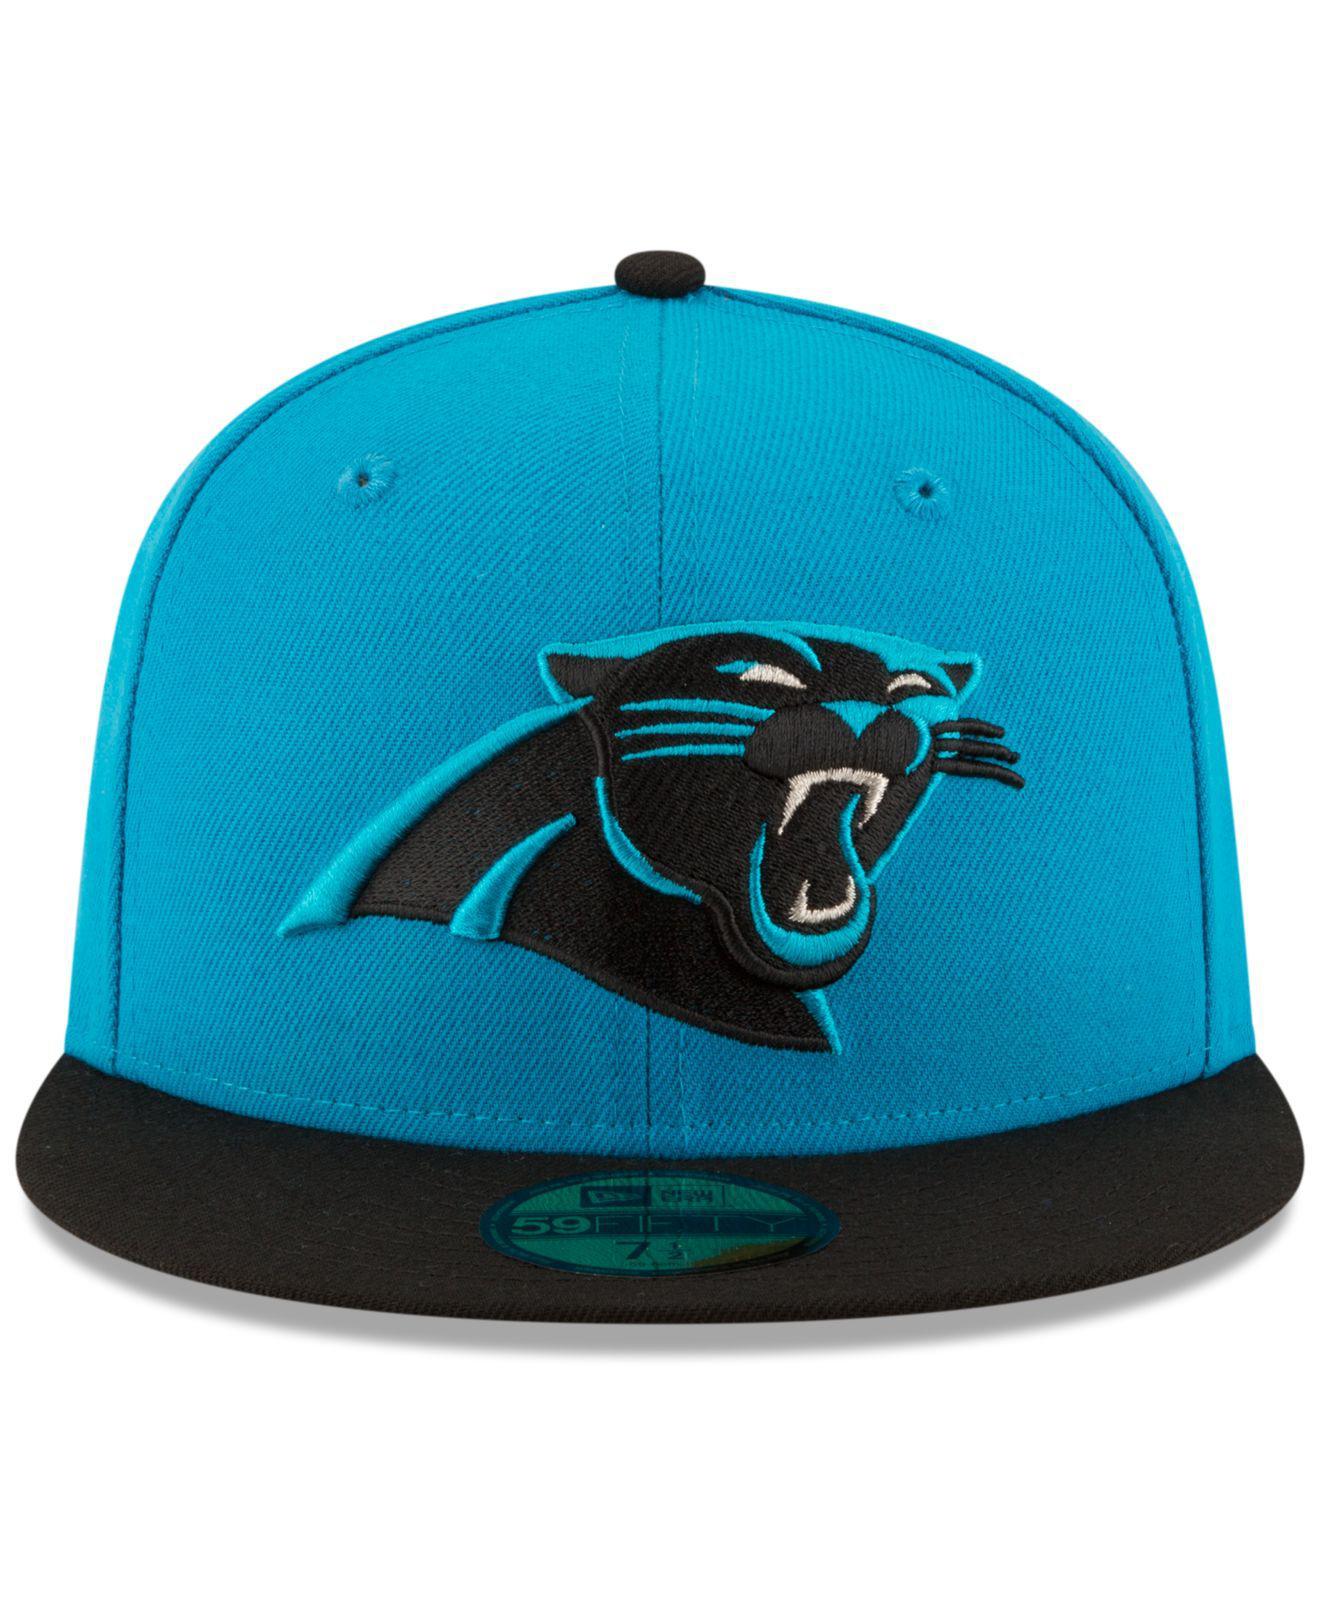 Lyst - Ktz Carolina Panthers Team Basic 59fifty Cap in Blue for Men 8c9fc7cda